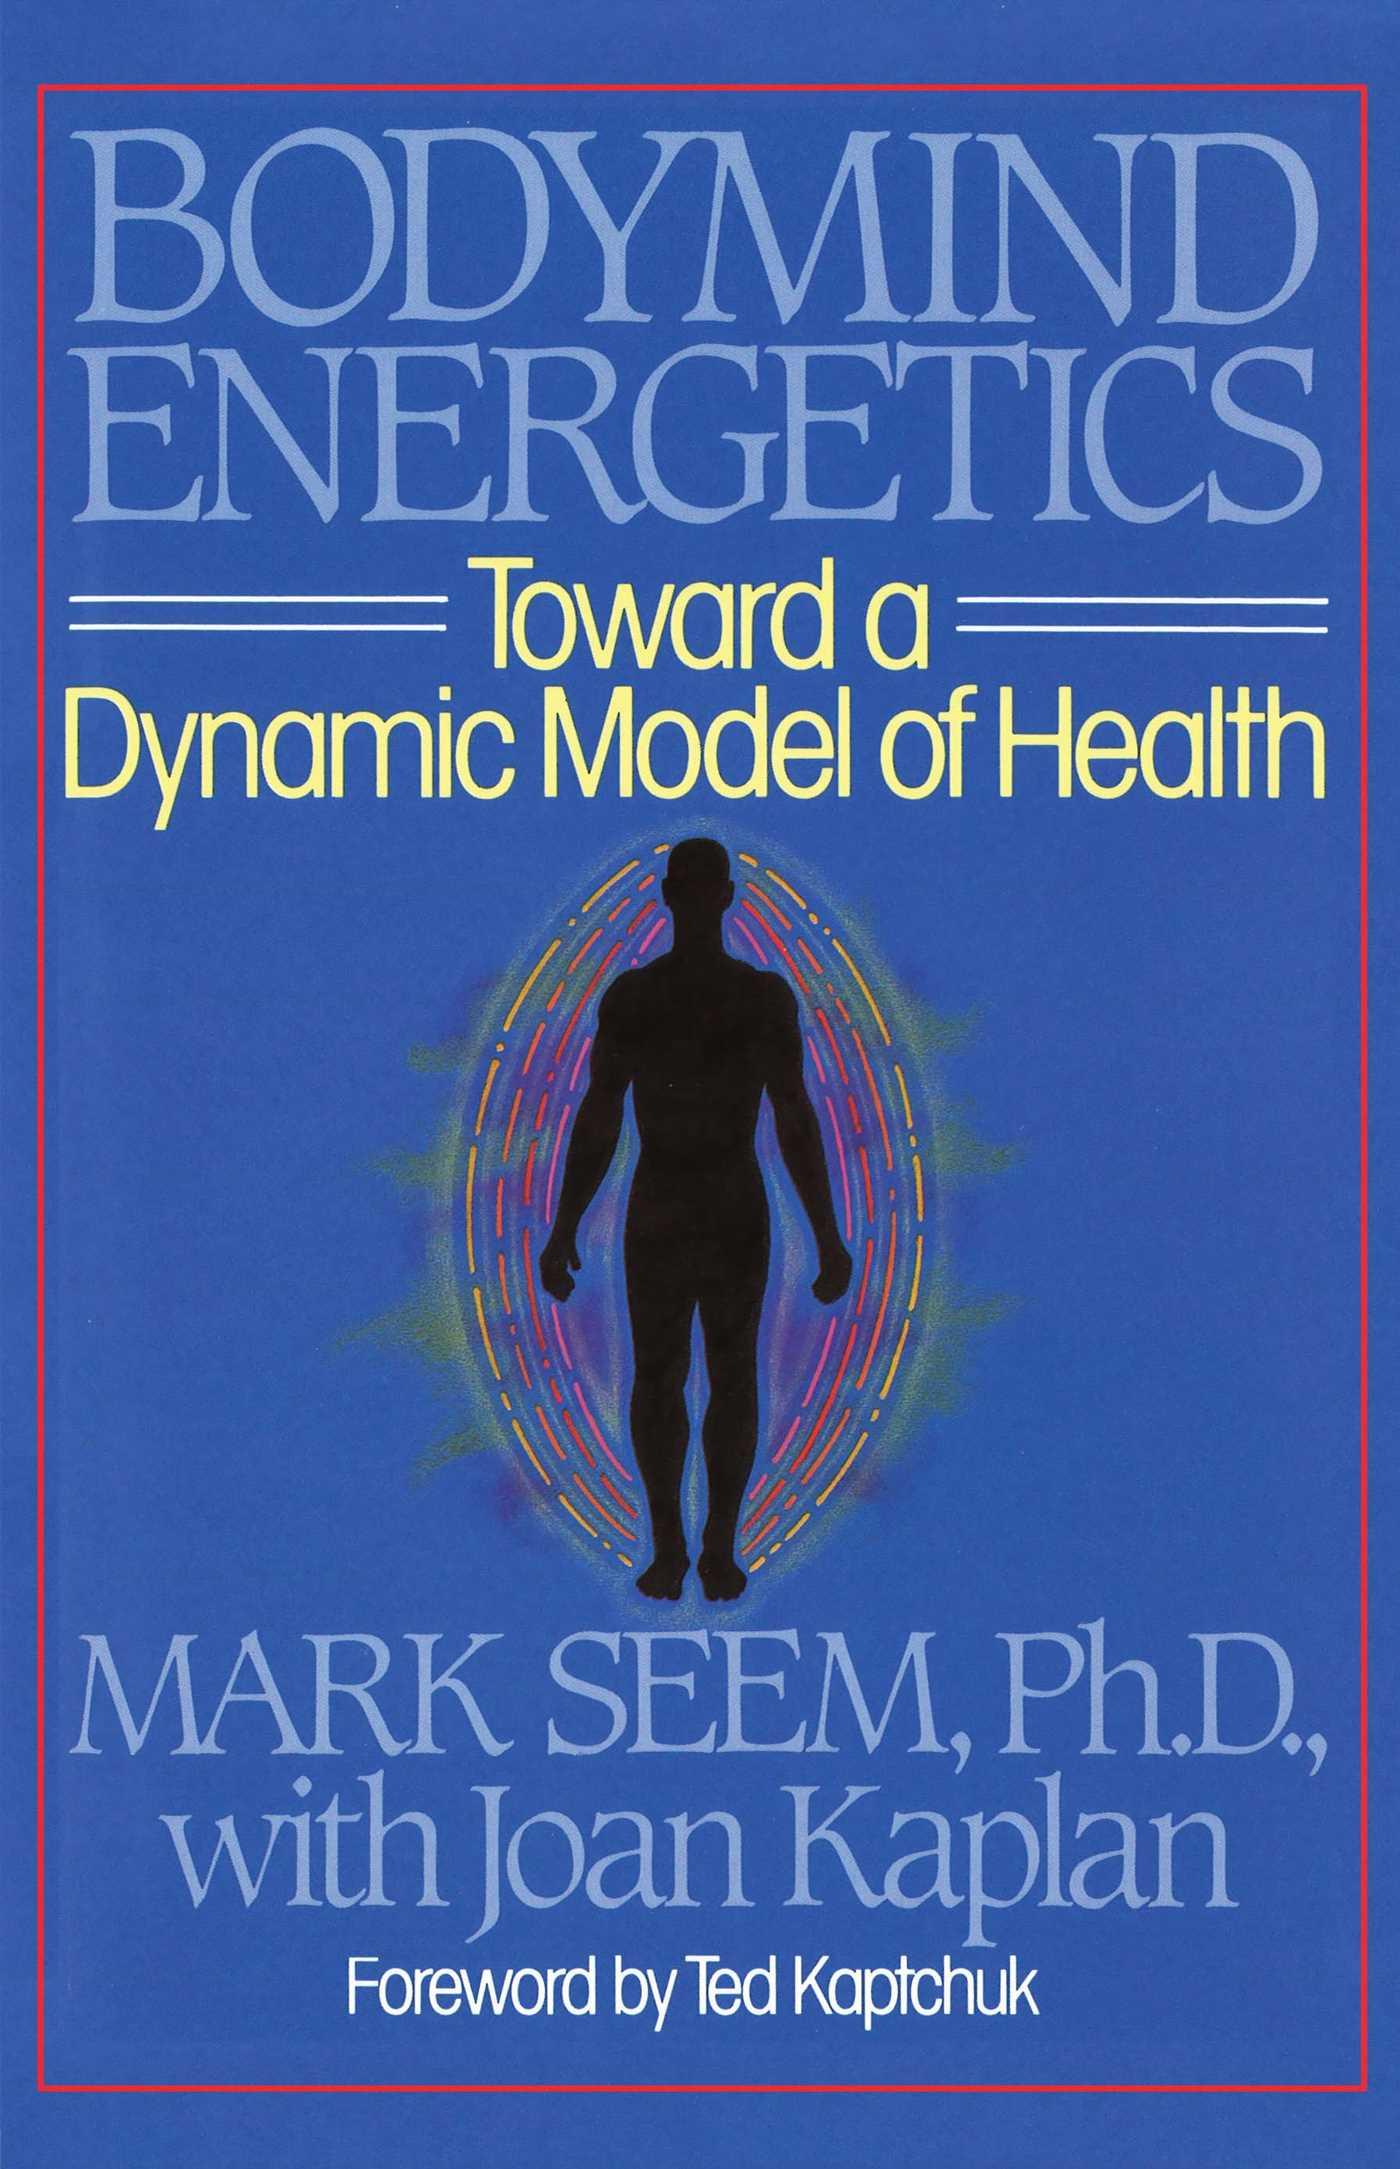 Bodymind energetics 9780892812462 hr